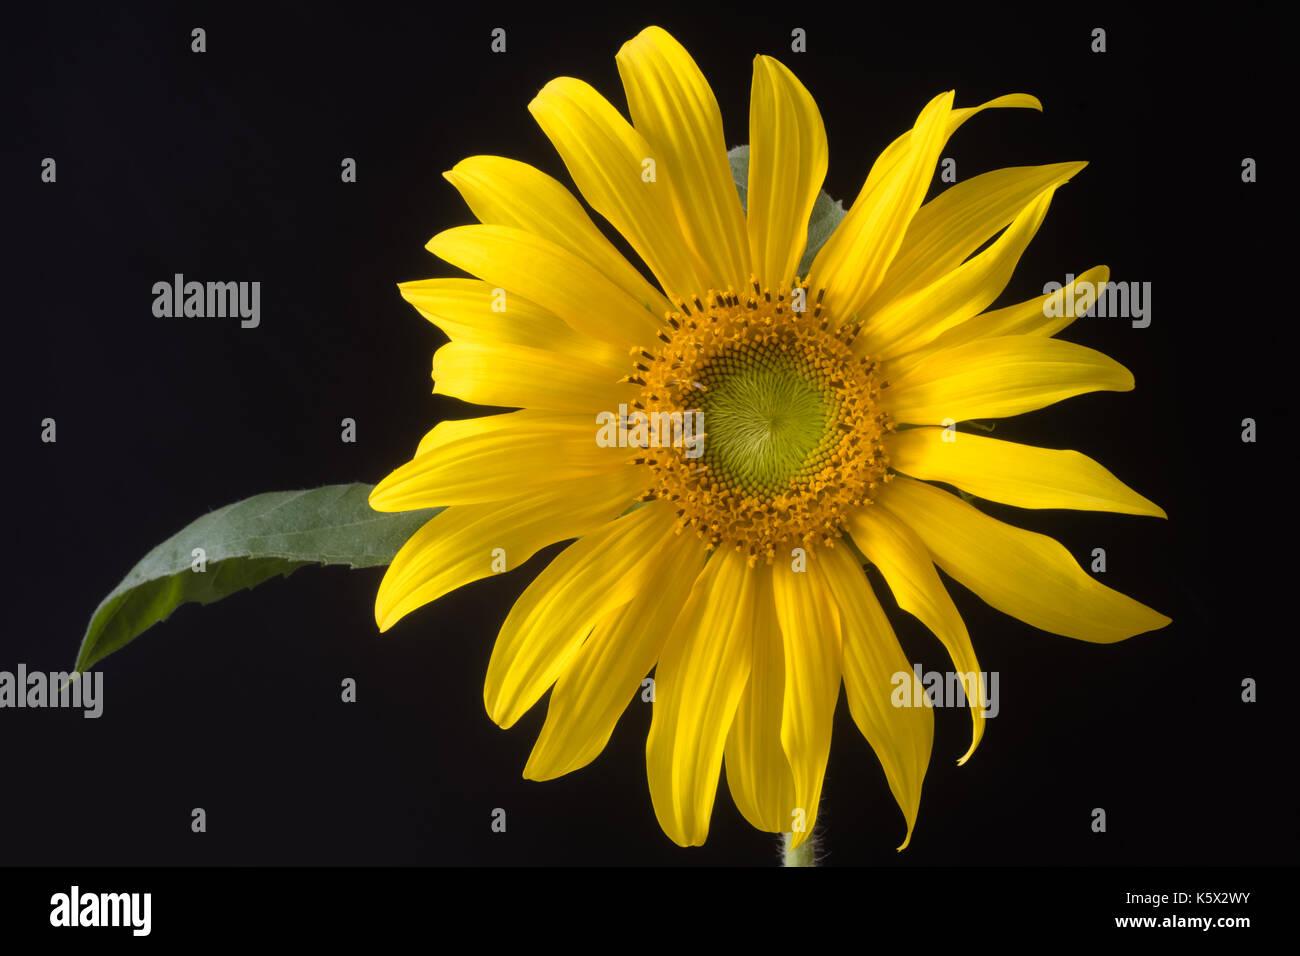 fibonacci flower stock photos fibonacci flower stock images alamy